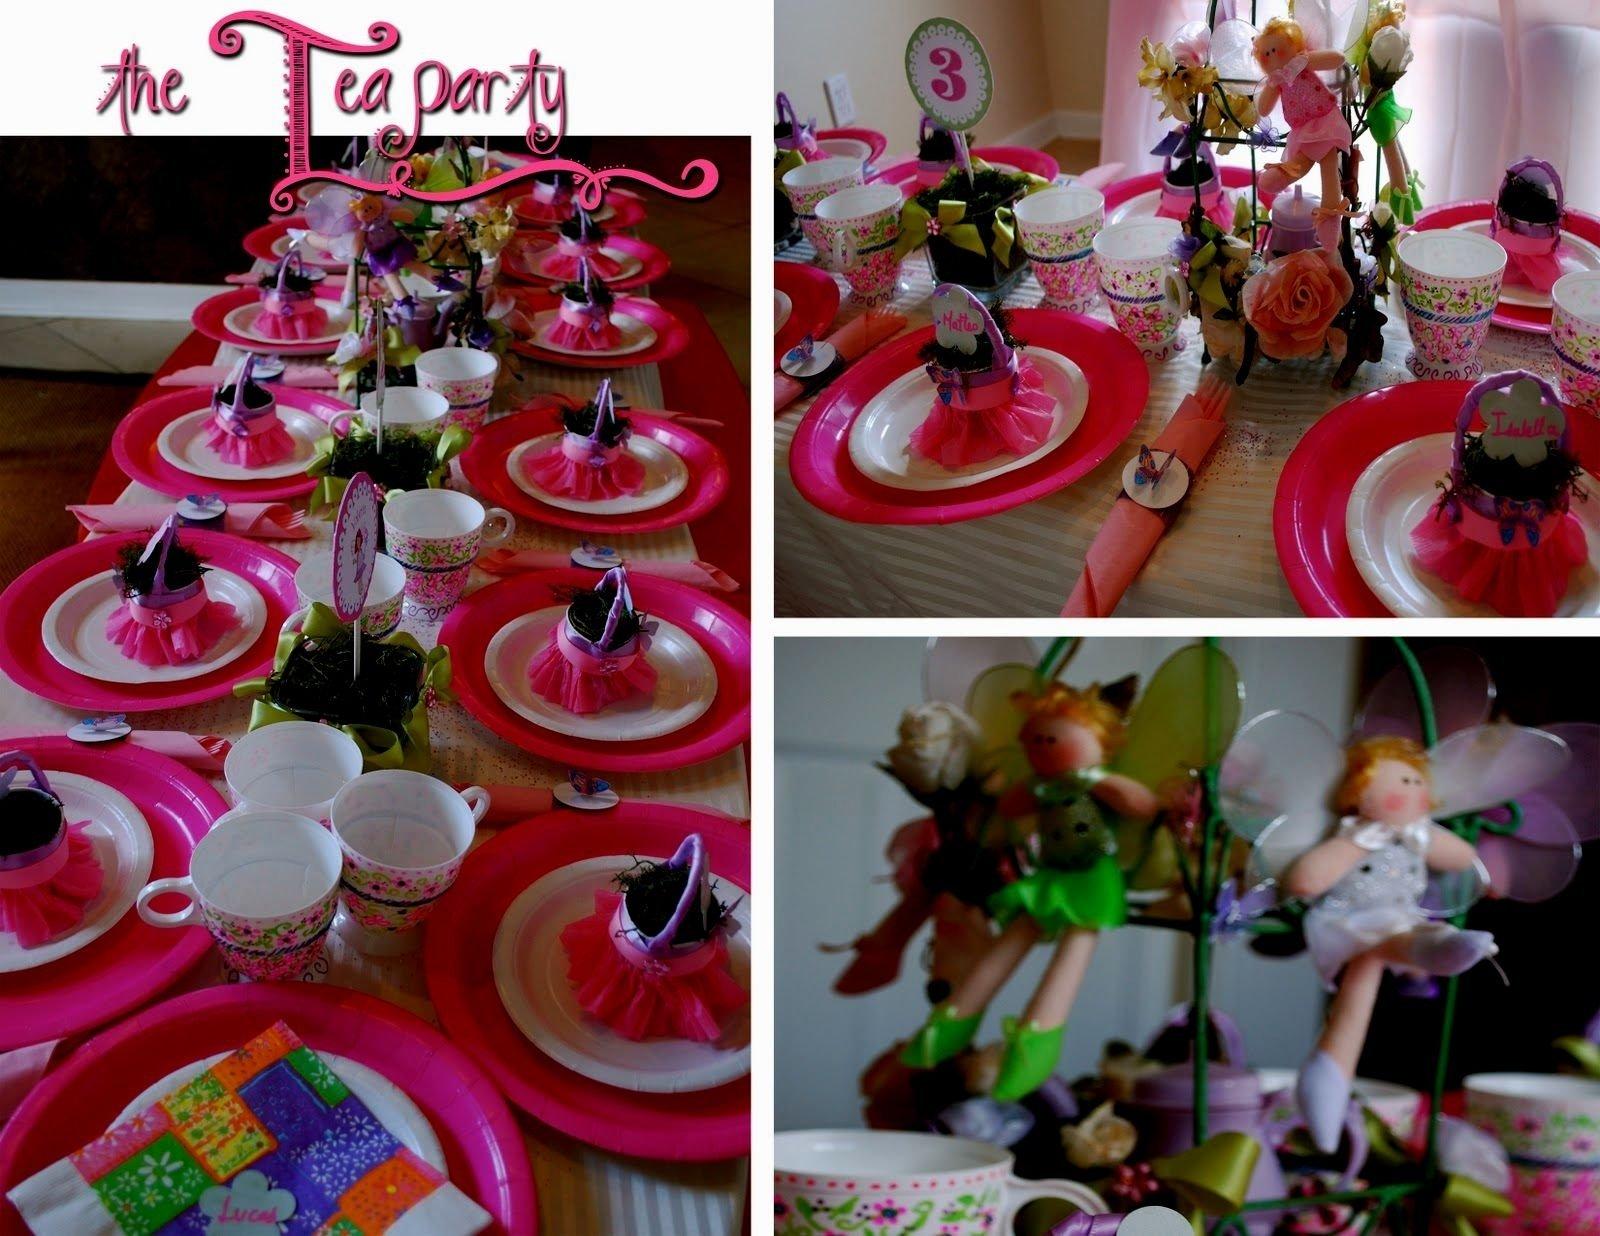 10 Wonderful Tea Party Ideas For Little Girls little kid tea party ideas decorating of party 1 2021